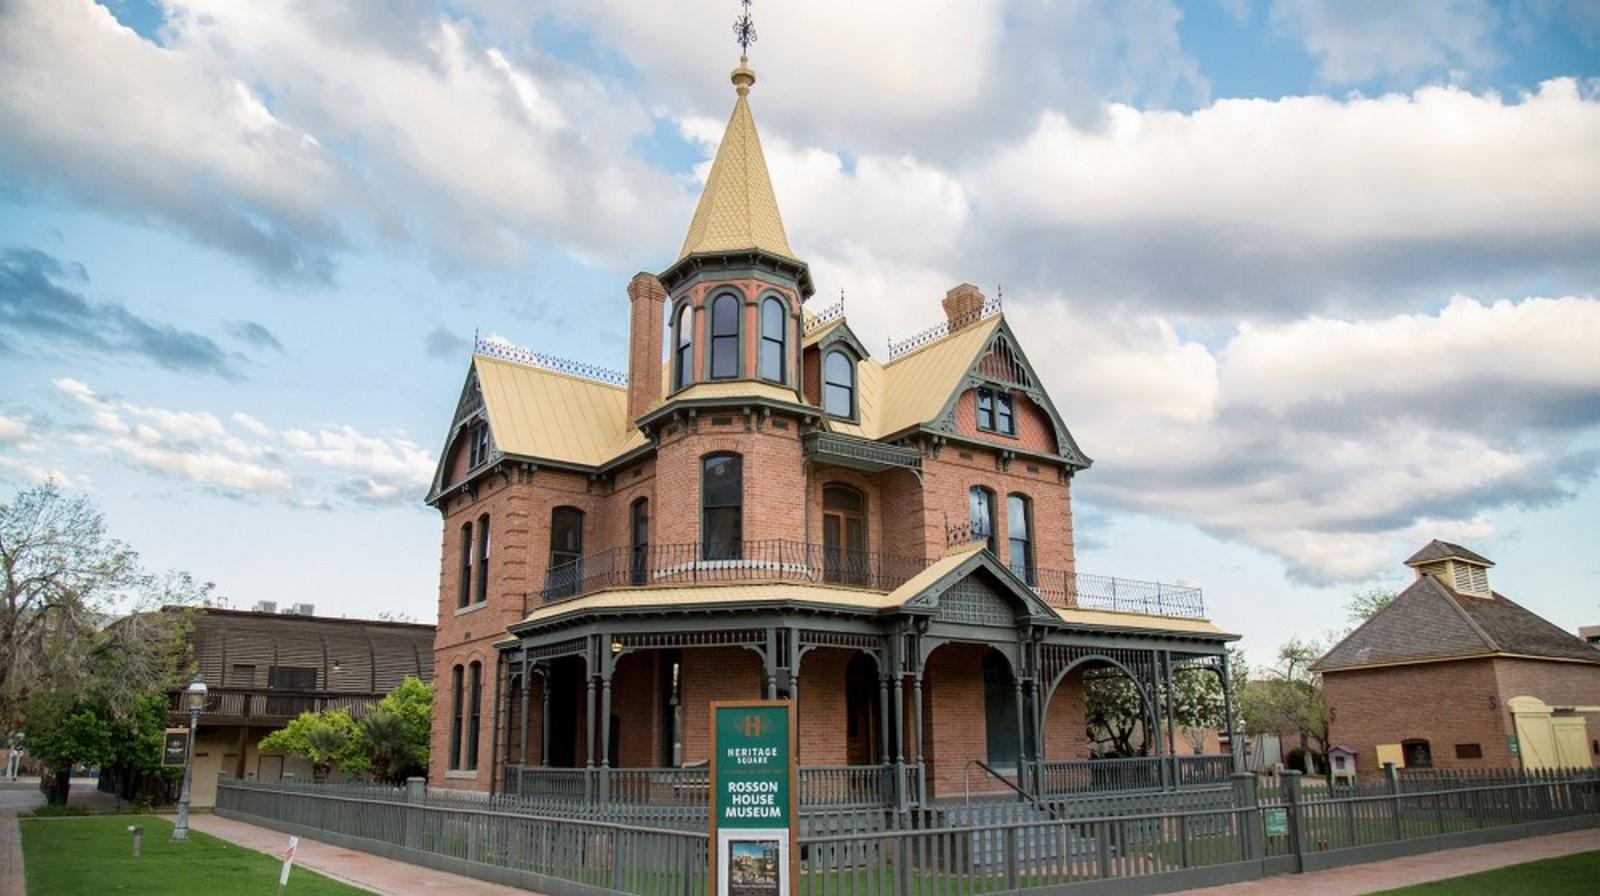 Rosson House Museum, Phoenix, USA - Sheet1